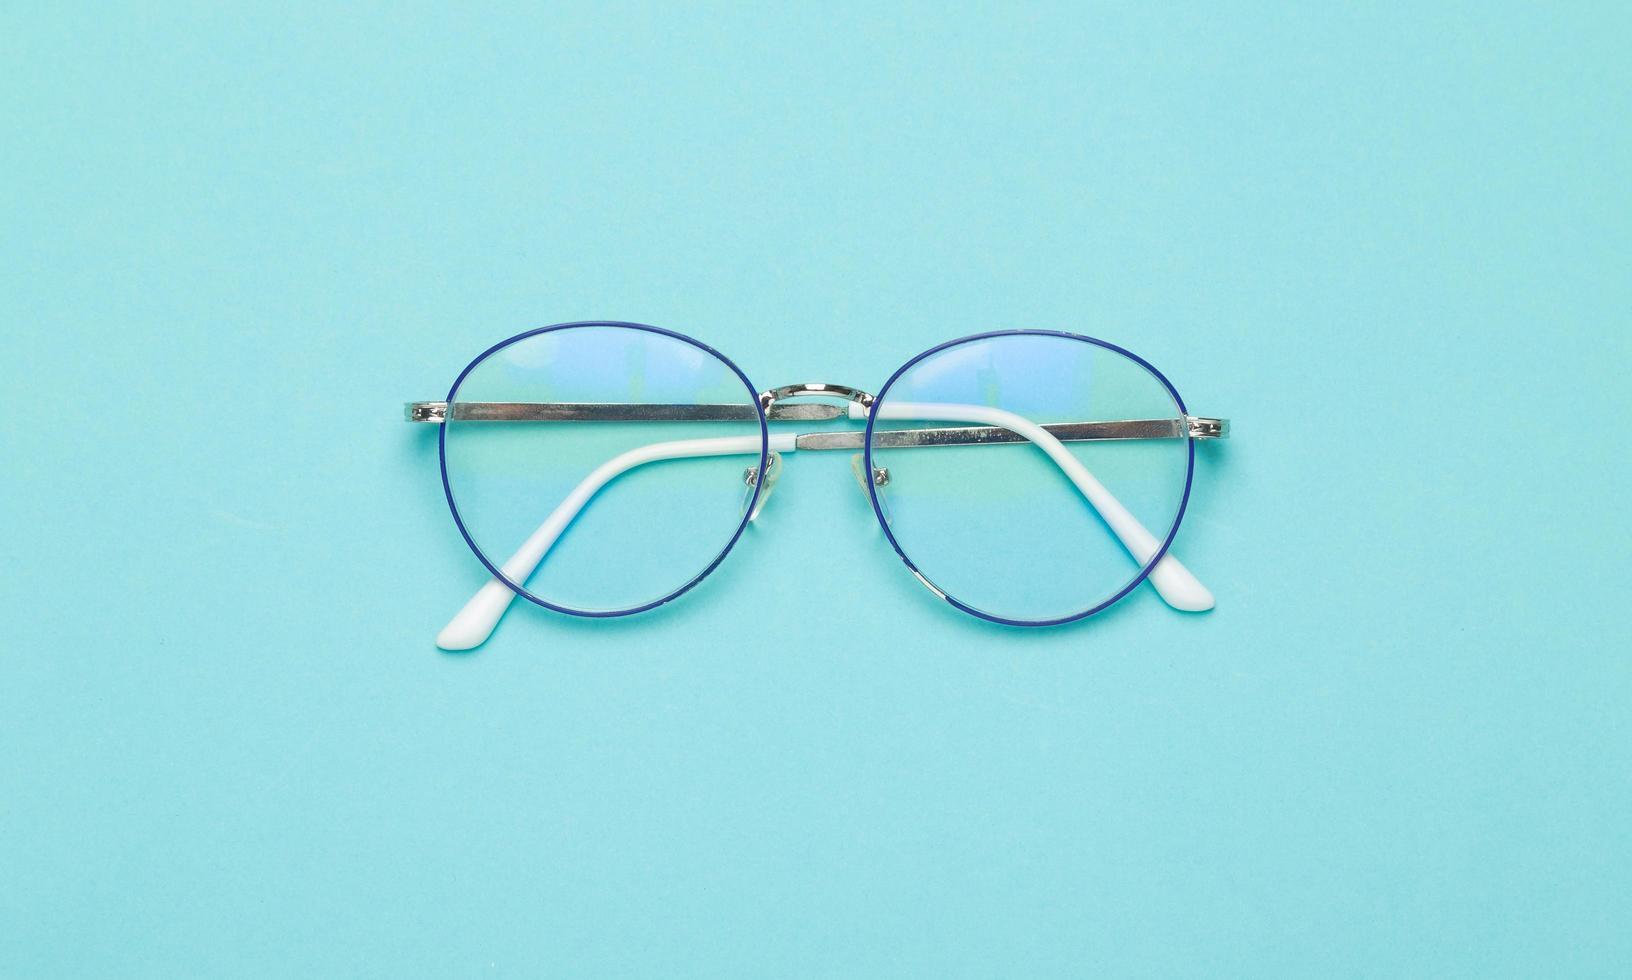 Glasses on blue background  photo